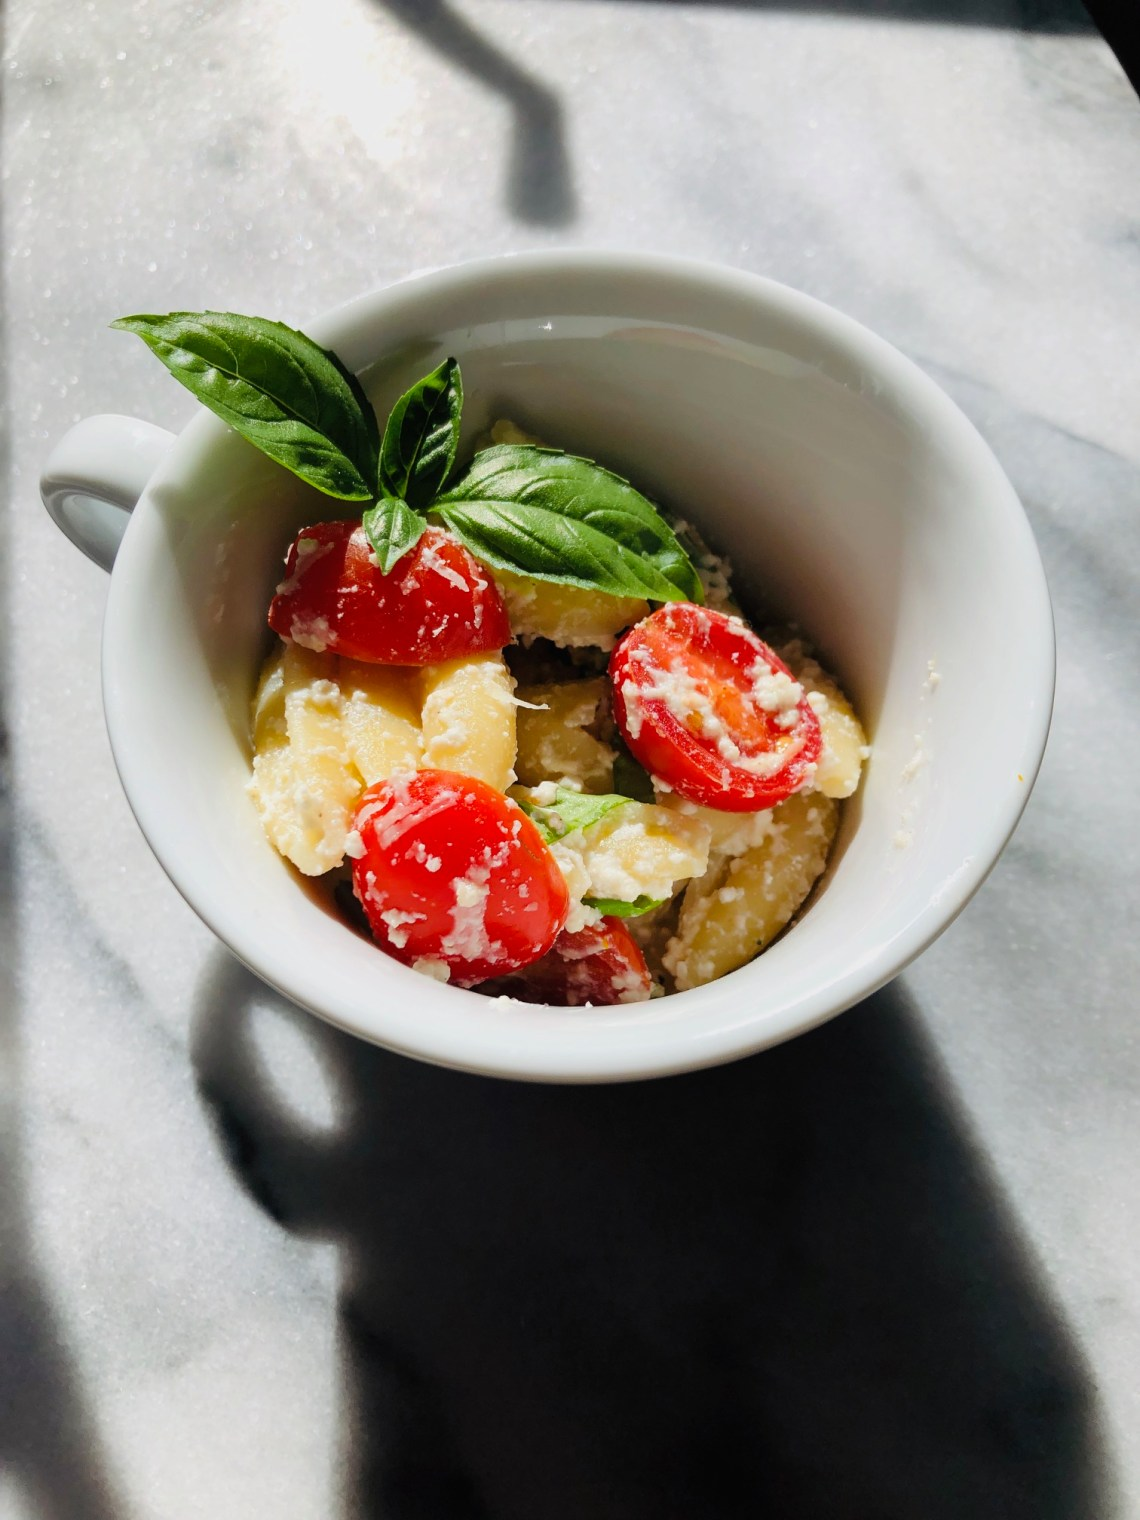 #recettesfamille #recettesansnoix #recettesansarachide #saladepâte #saladedepâtes #saladedepatesail #buffet #buffetfroid #potluck #recettevegetarienne #recettevege #recettevégé